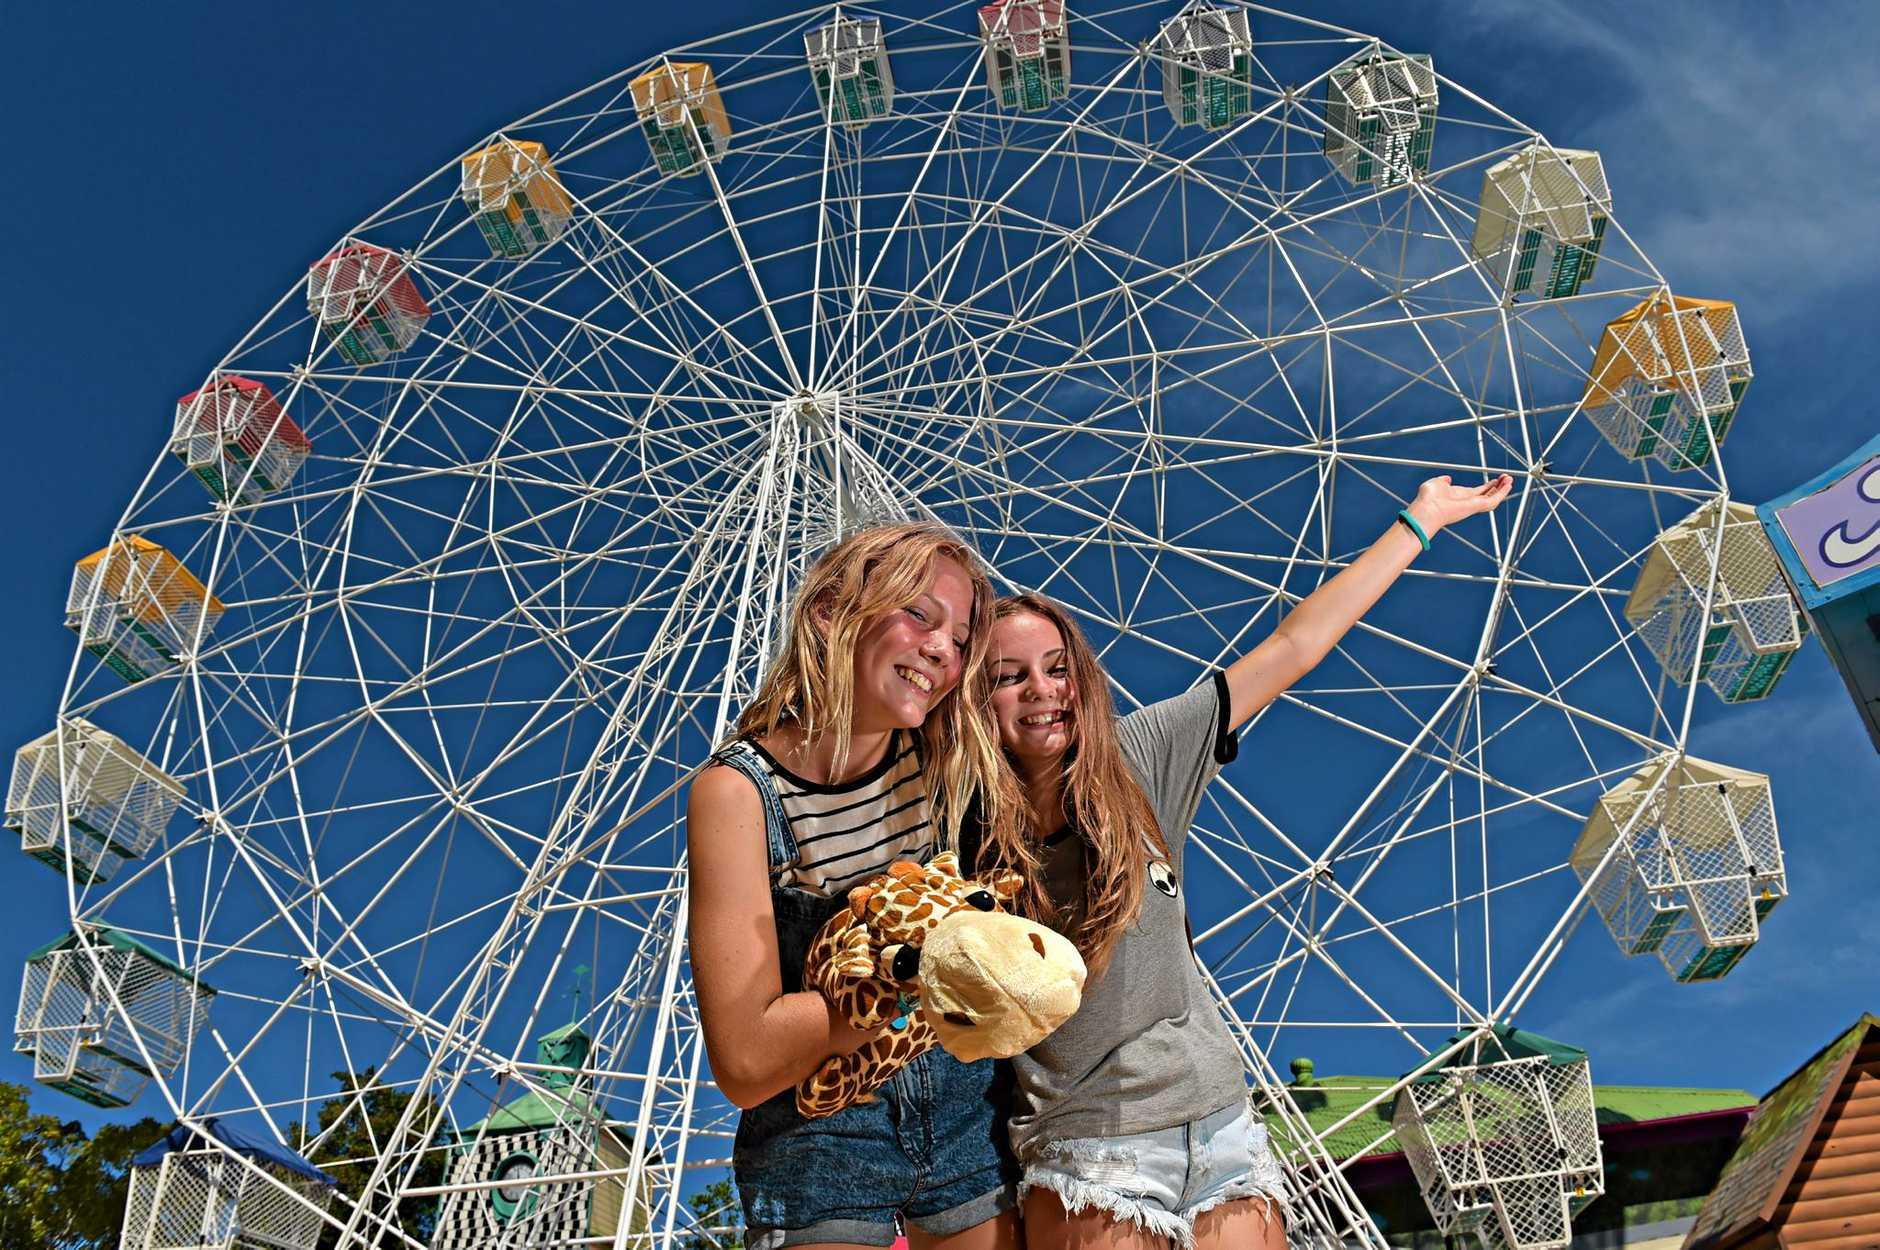 Izzy Denby,14, and Isabella Palmer,14, can't wait to ride the refurbished ferris wheel at Aussie World. Photo: Warren Lynam / Sunshine Coast Daily